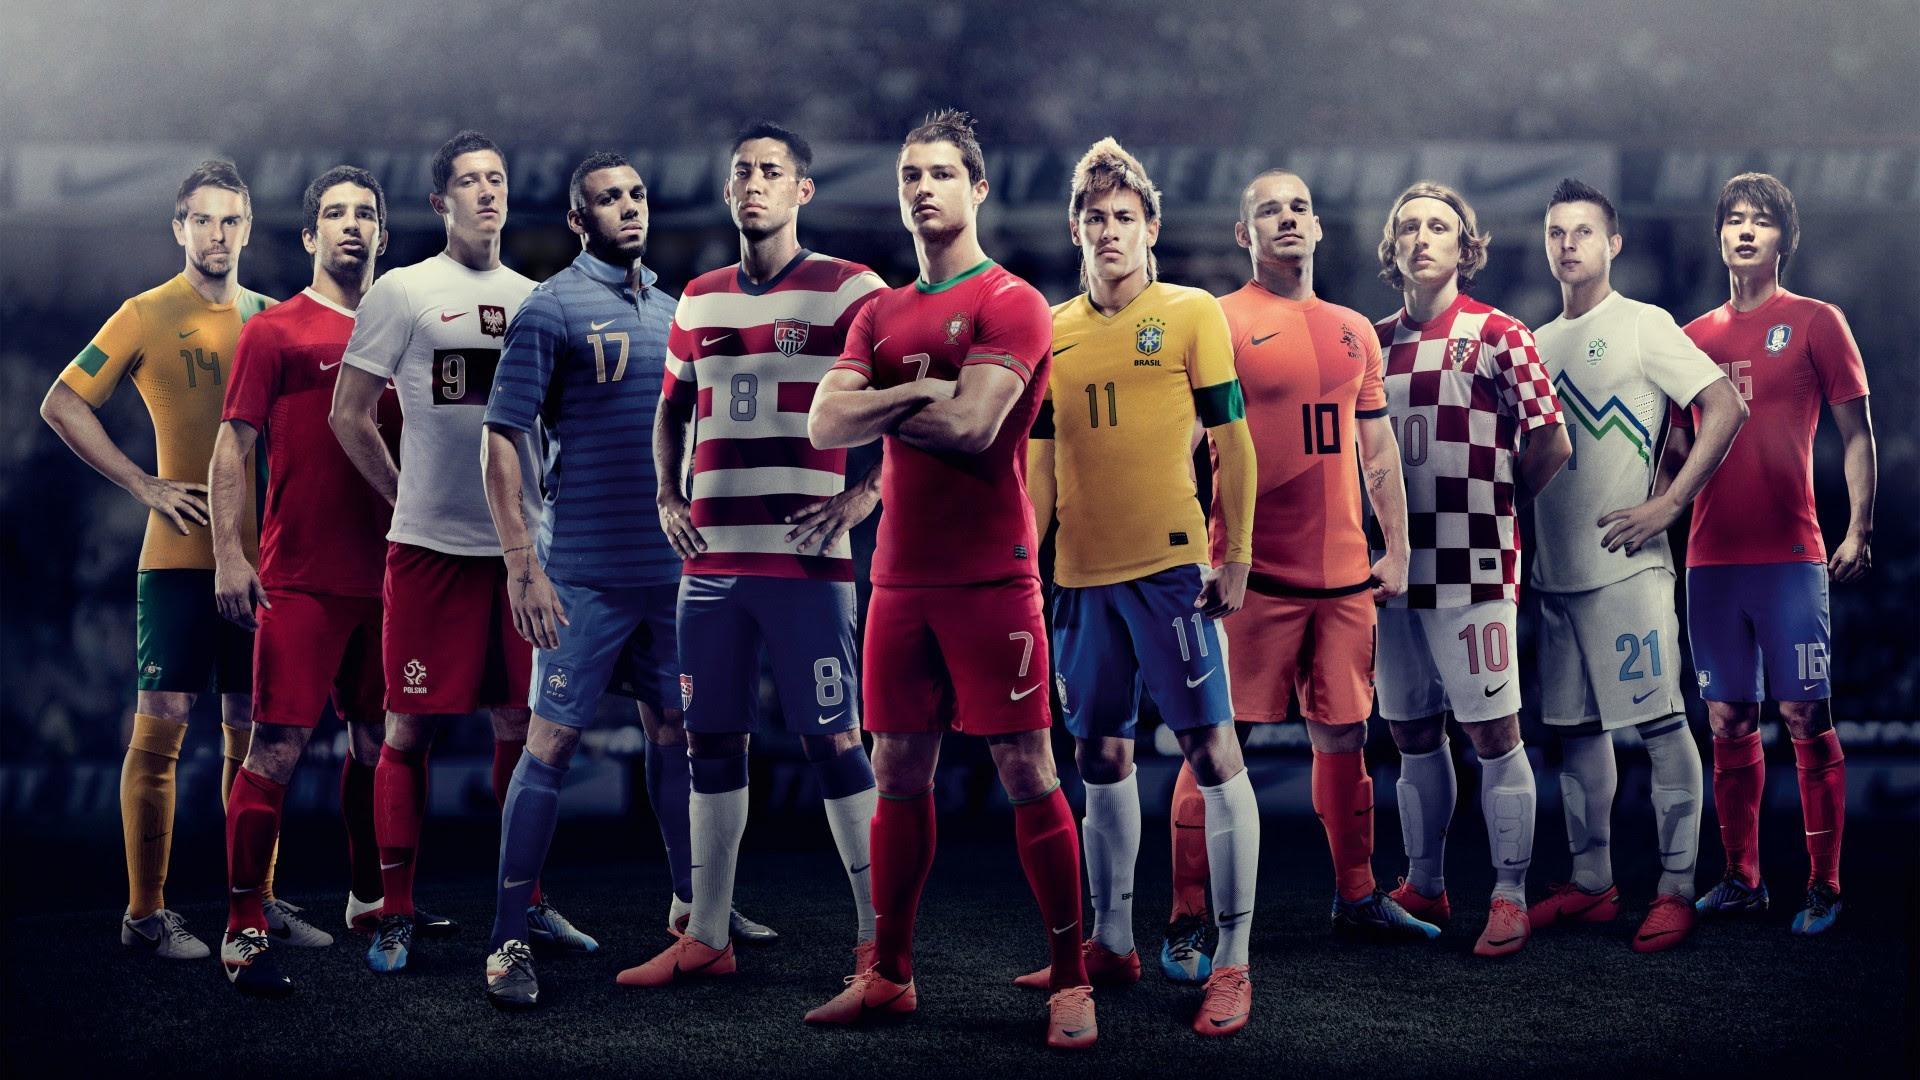 200+ Wallpaper Hd Football HD Gratis